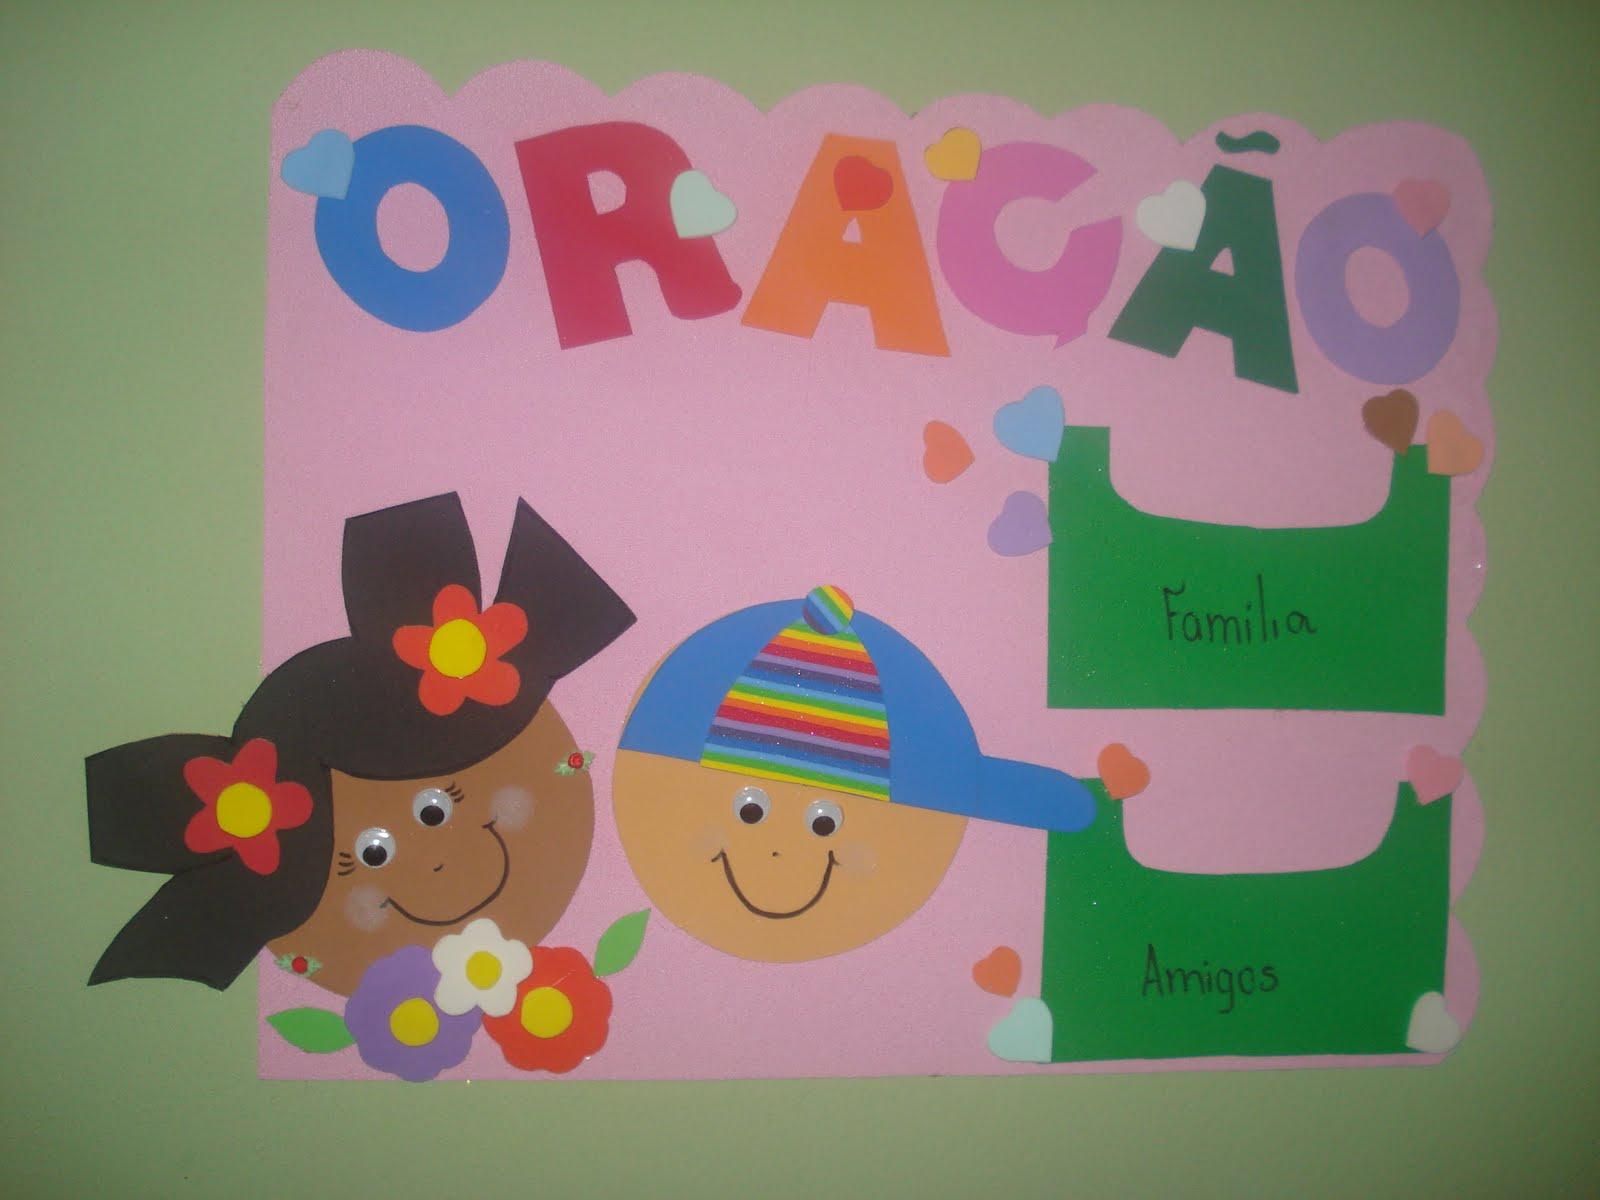 decoracao de sala infantil escola dominical : decoracao de sala infantil escola dominical:de oração para a minha Classe de Escola Dominical como forma de